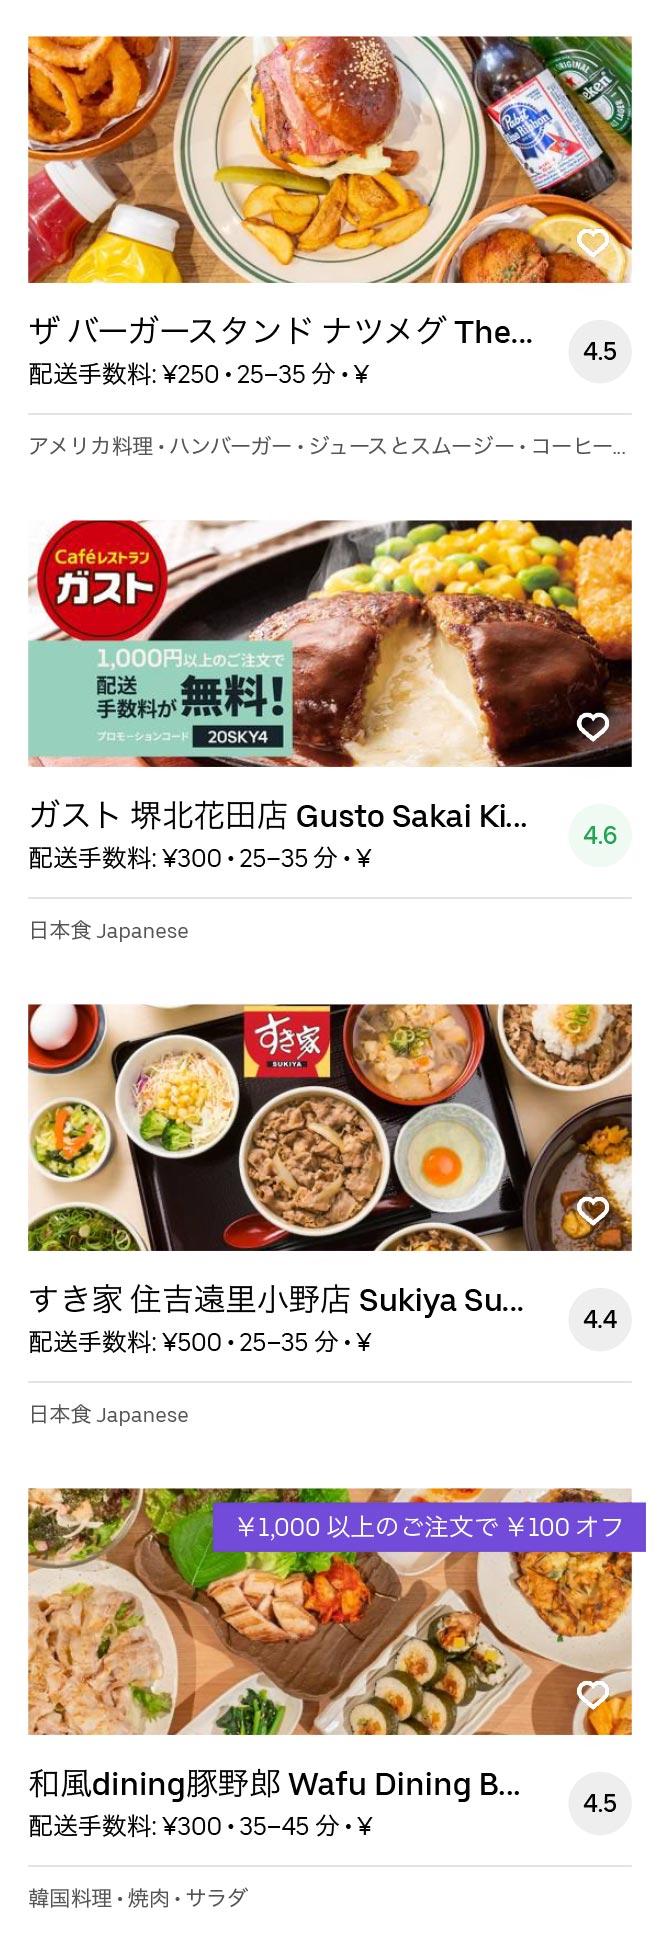 Sakai nakamozu menu 2005 04